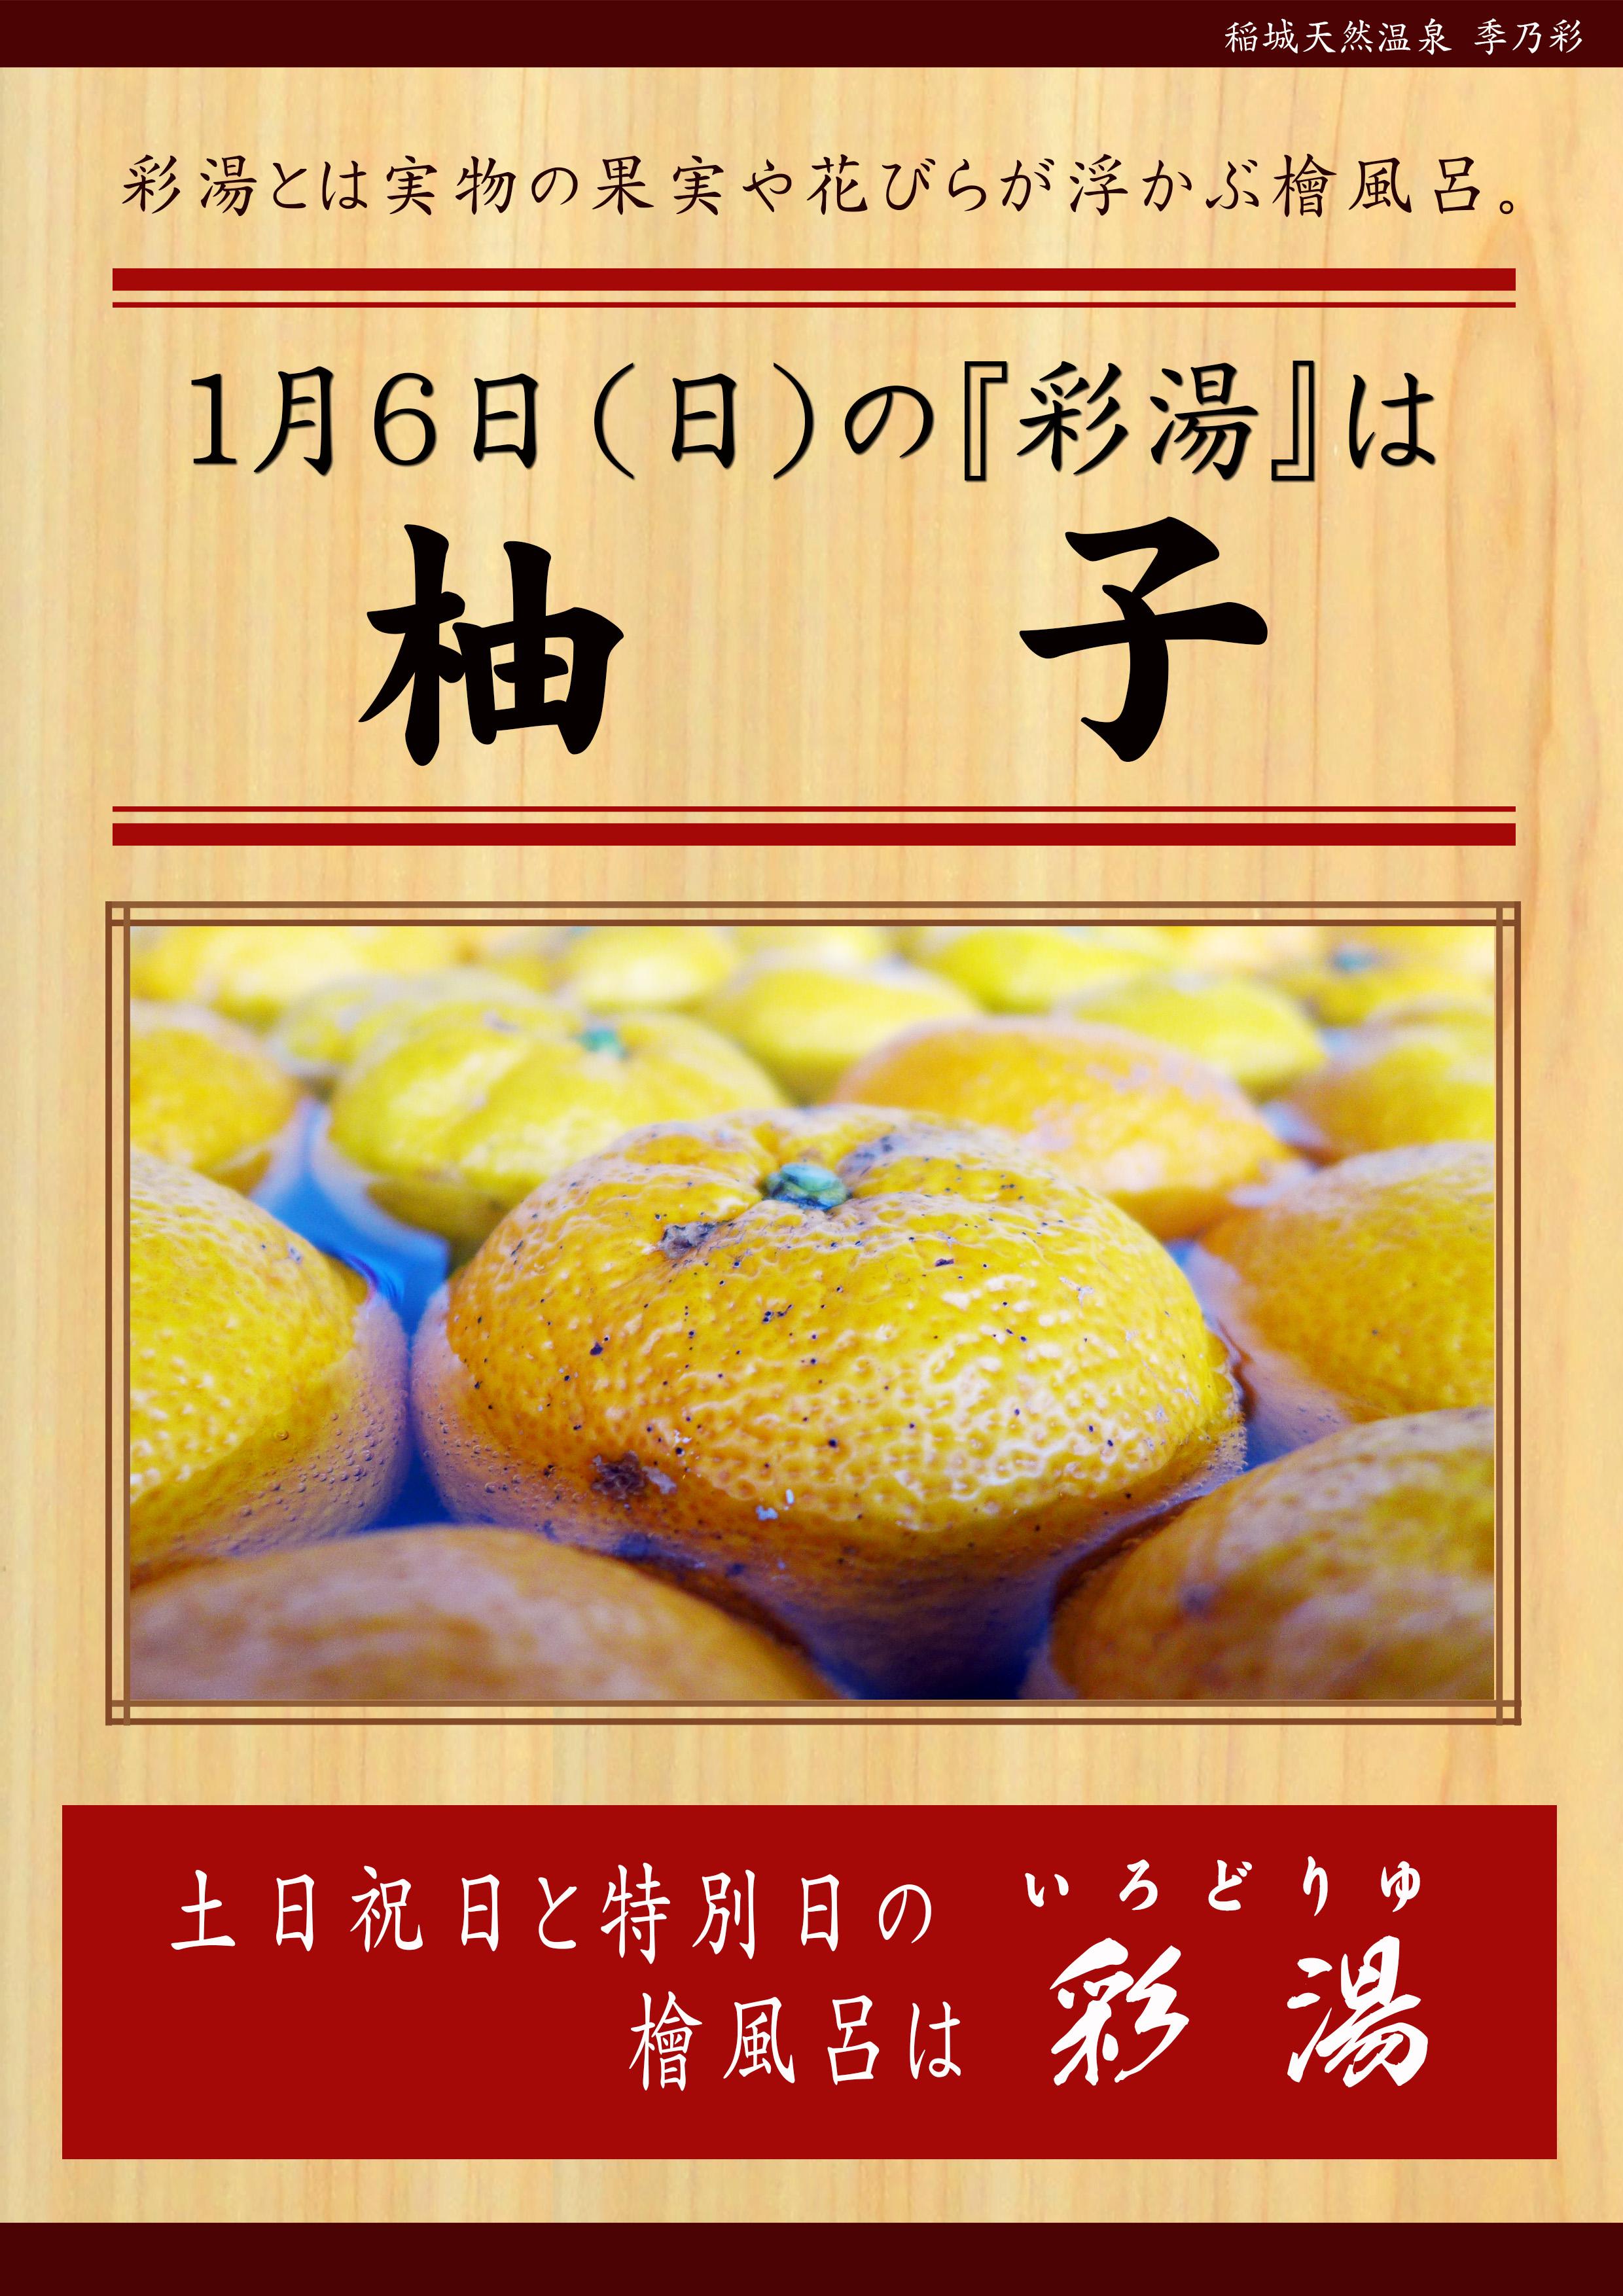 20190106POP イベント 彩湯 柚子